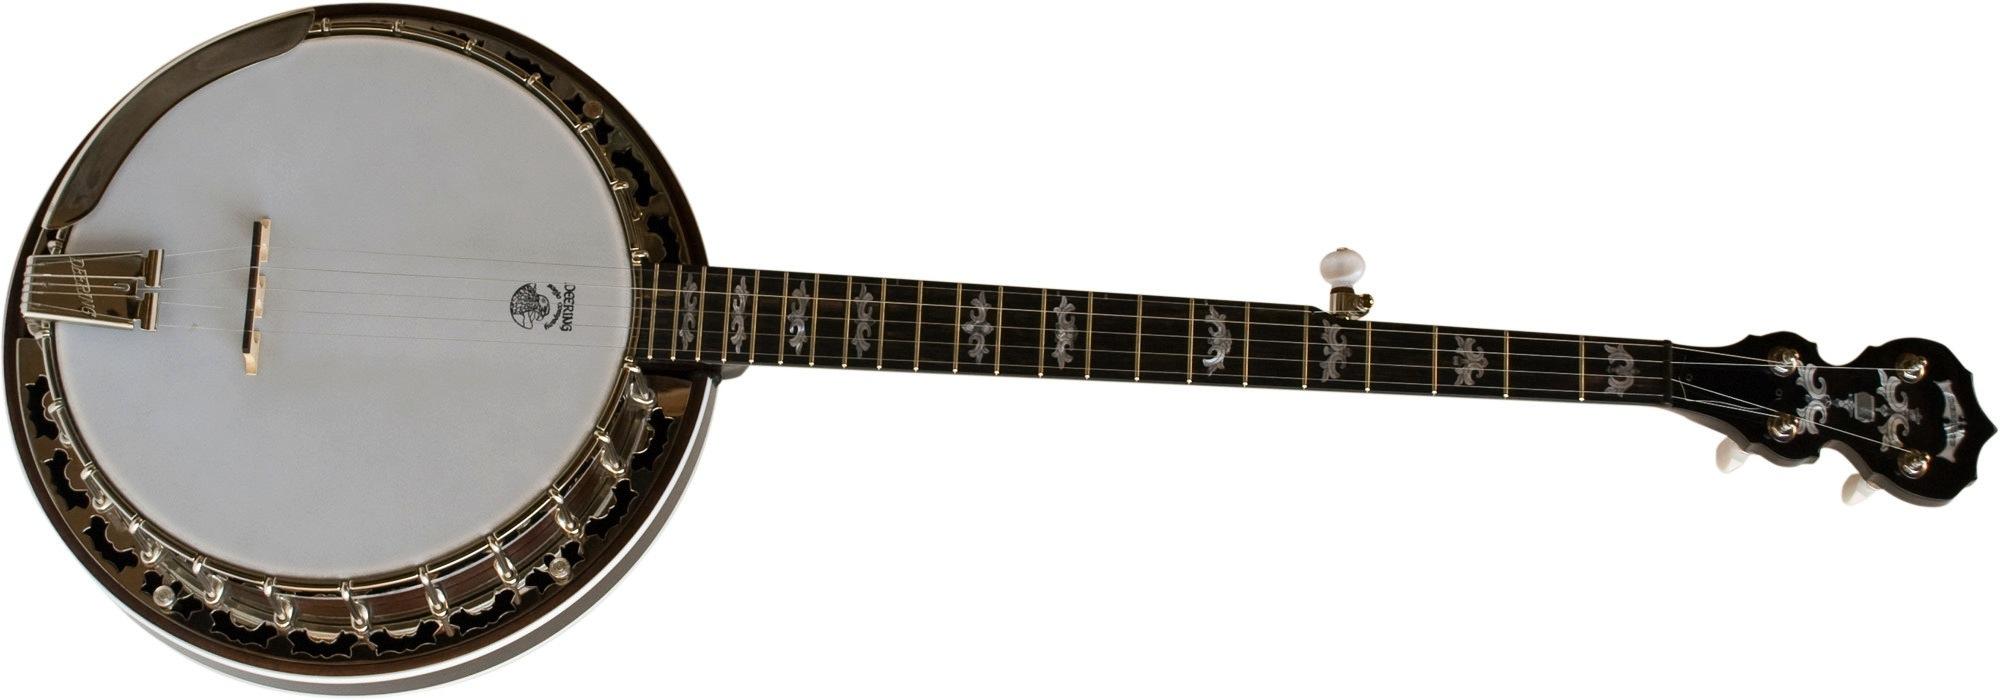 Deering Eagle II 5-String Resonator Banjo - Bluegrass and